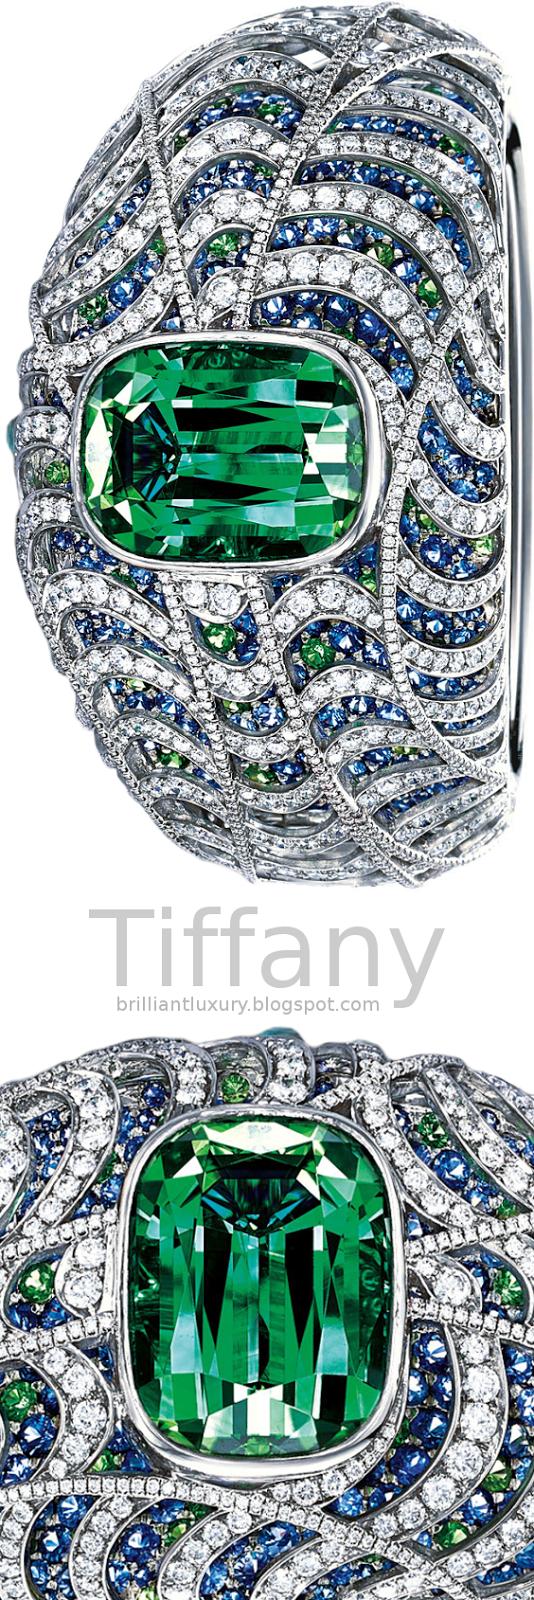 Brilliant Luxury ♦ Tiffany prism ripple bracelet